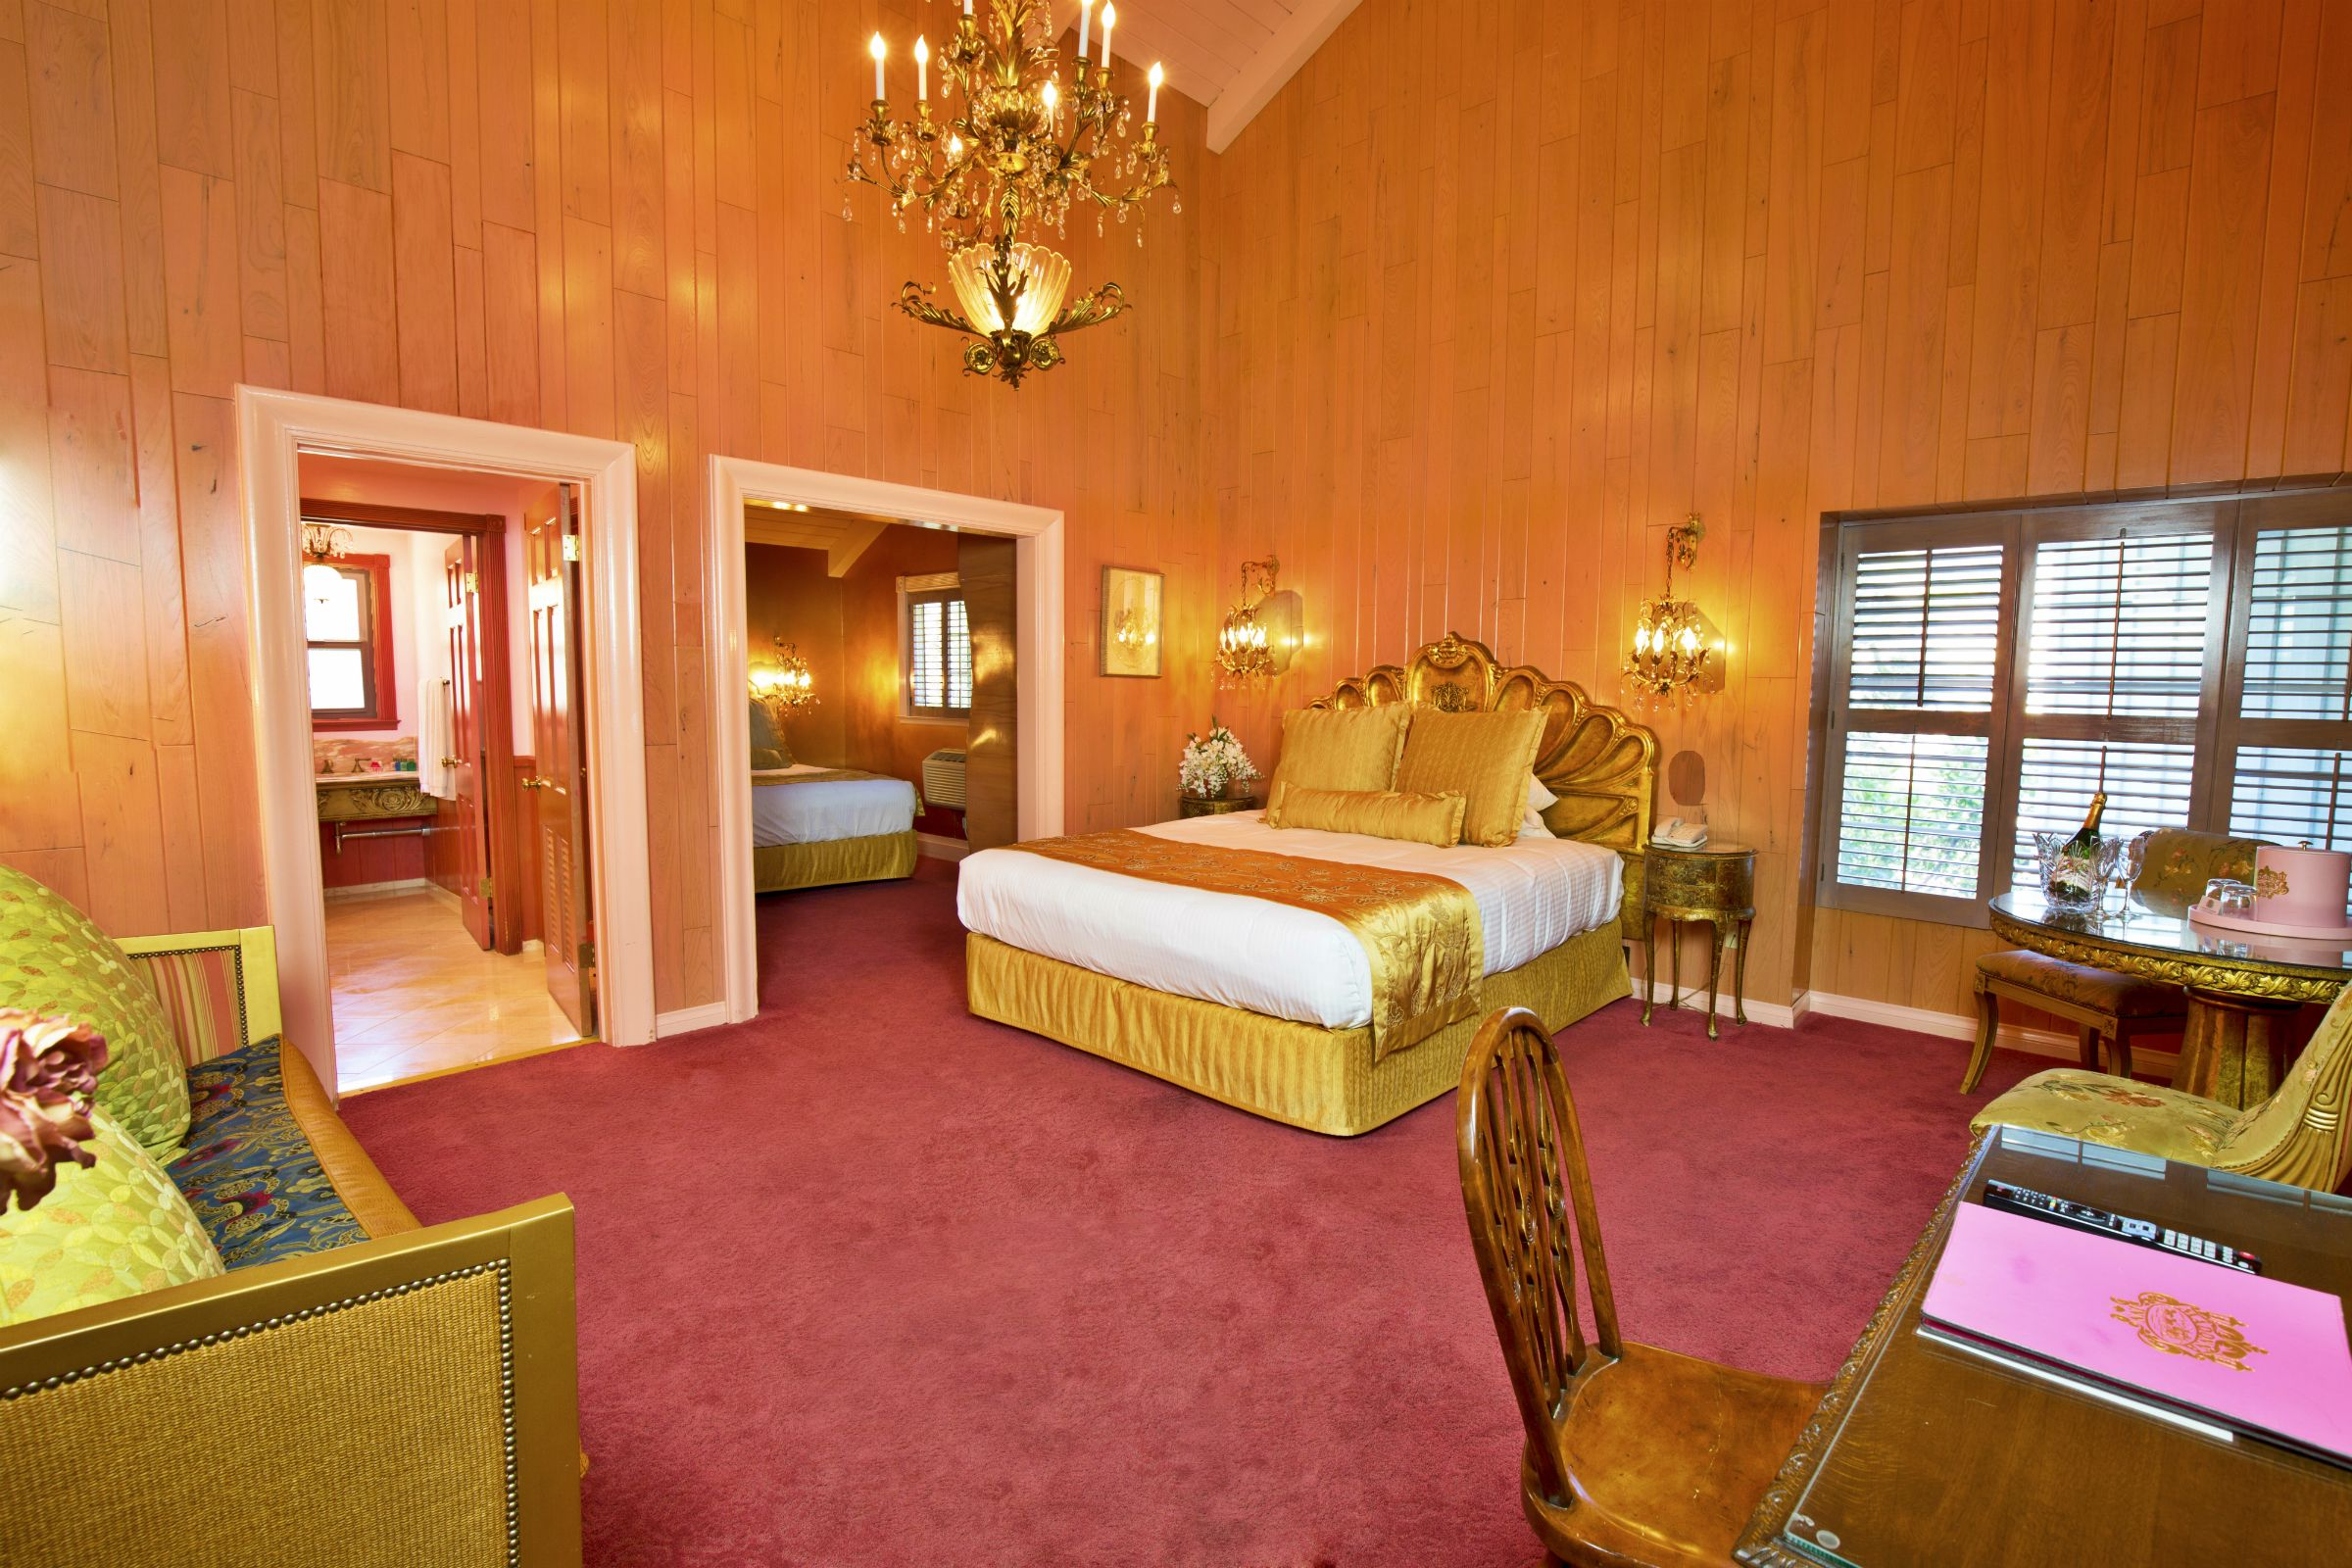 Morning Star Room 215 Unique Hotel Rooms Madonna Inn Rooms Room